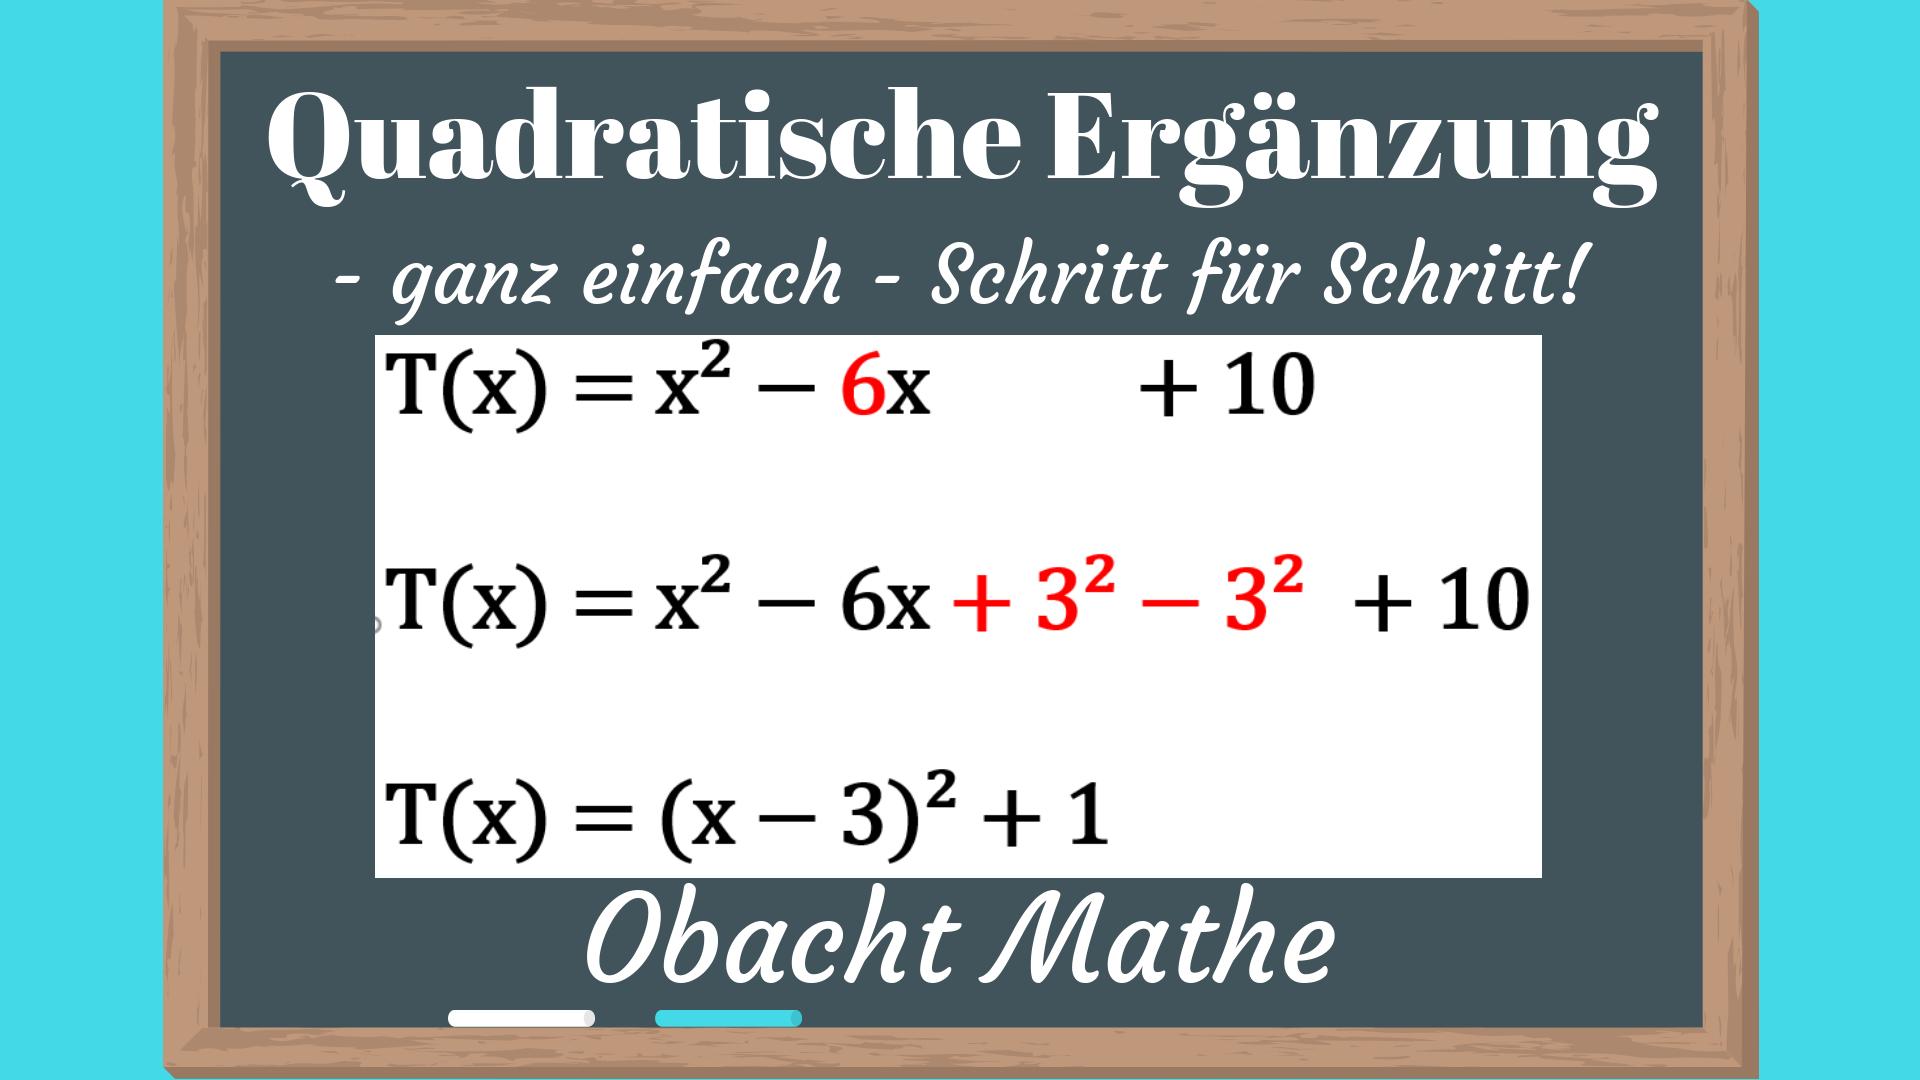 Quadratische Erganzung Schritt Fur Schritt Ganz Einfach Erklart Quadratische Funktionen Extremwerte Obachtmathe Quadratische Funktion Mathe Quadrat